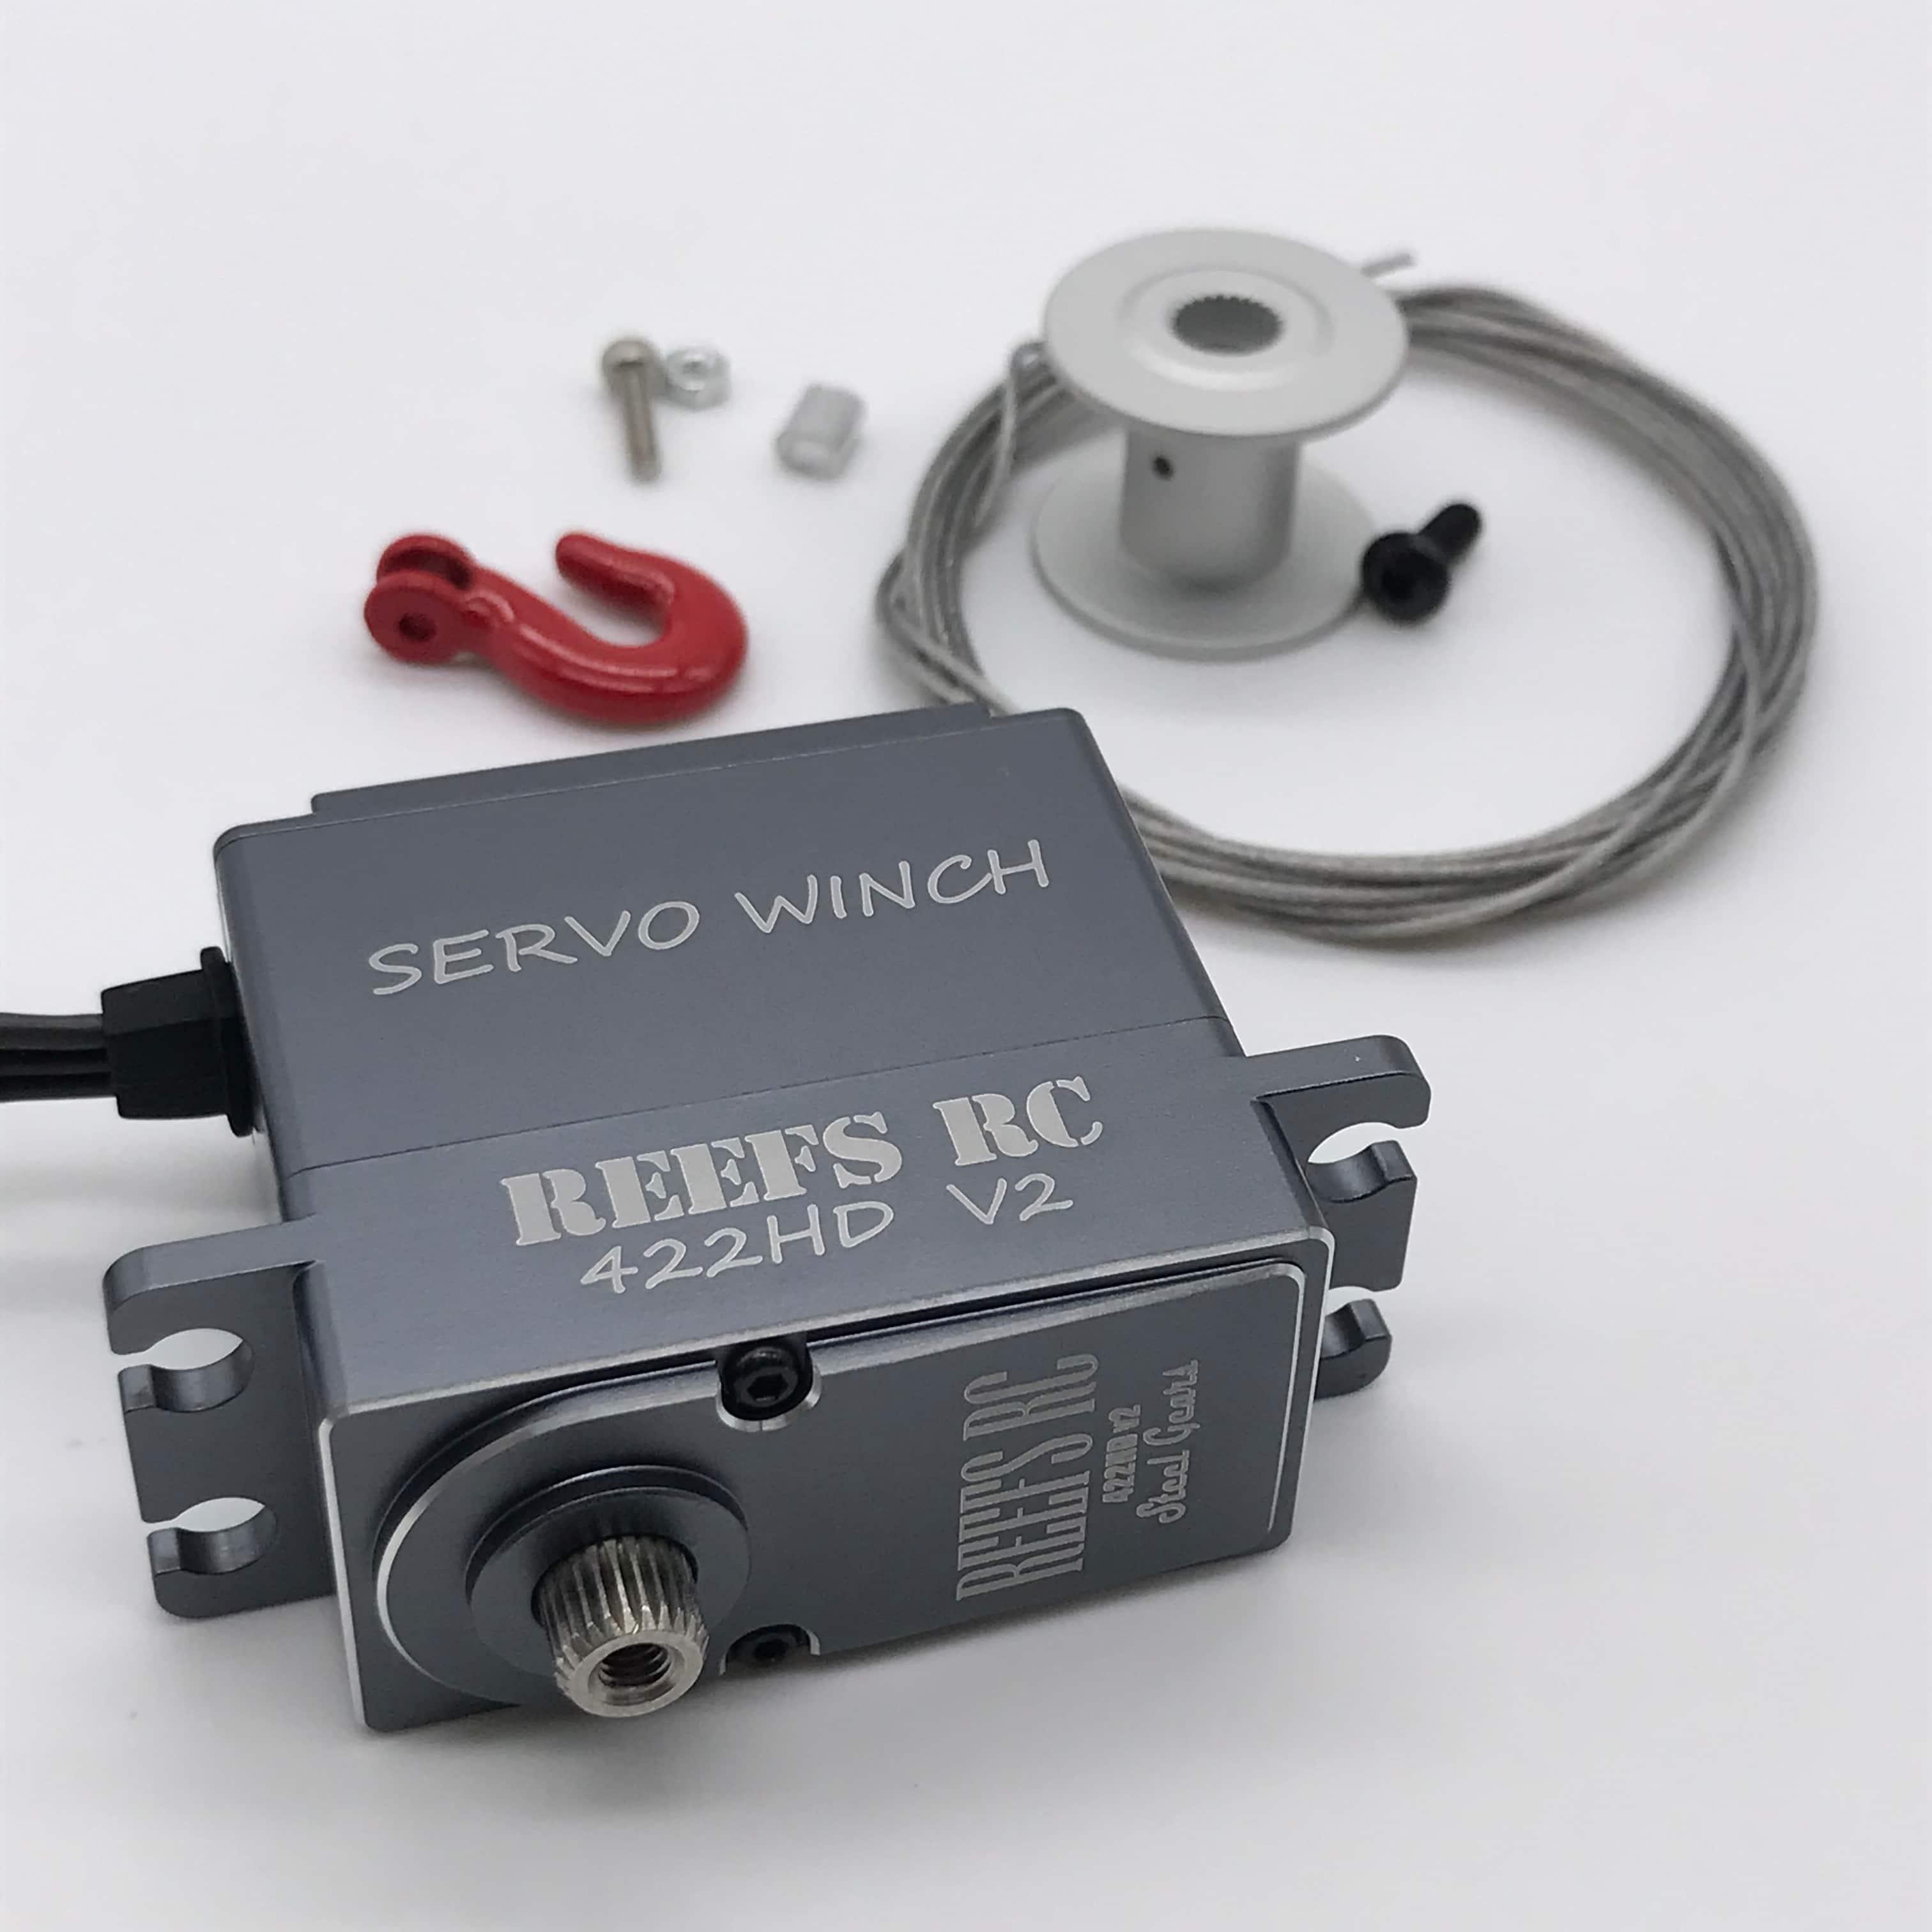 REEF'S RC 422HDv2 Servo Winch Kit